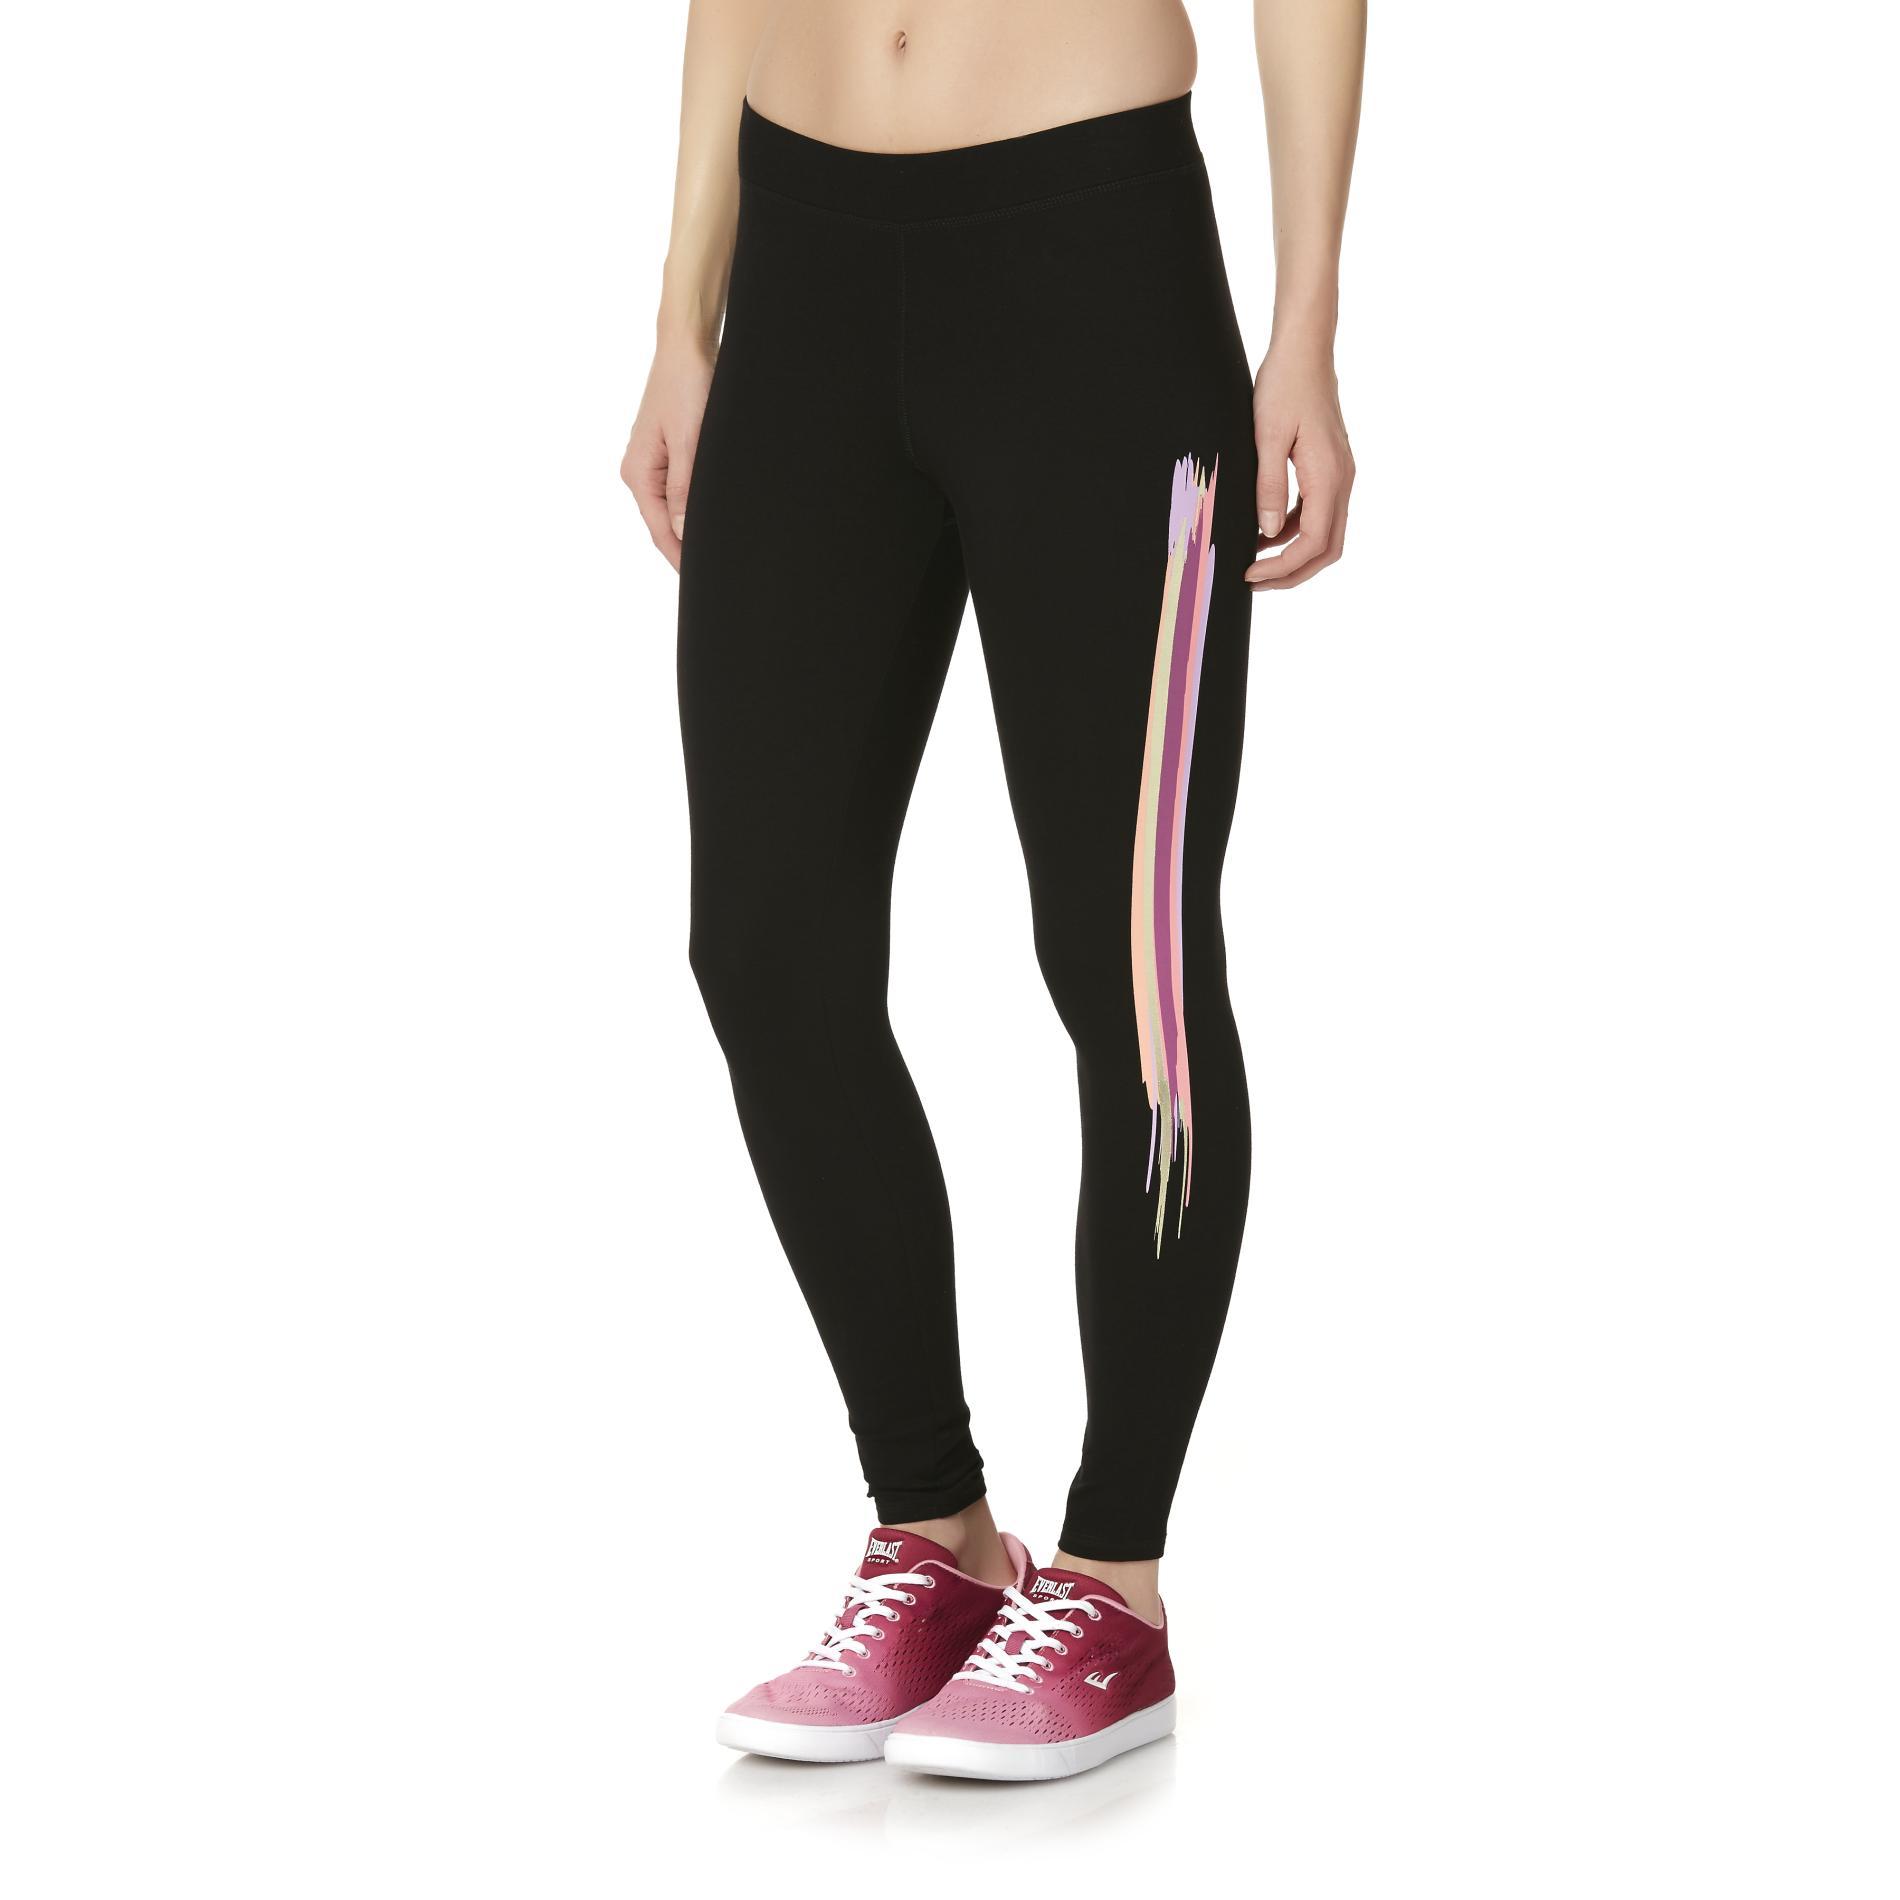 Everlast® Sport Women's Athletic Leggings - Striped PartNumber: A012688211 MfgPartNumber: WS8EK53201MI